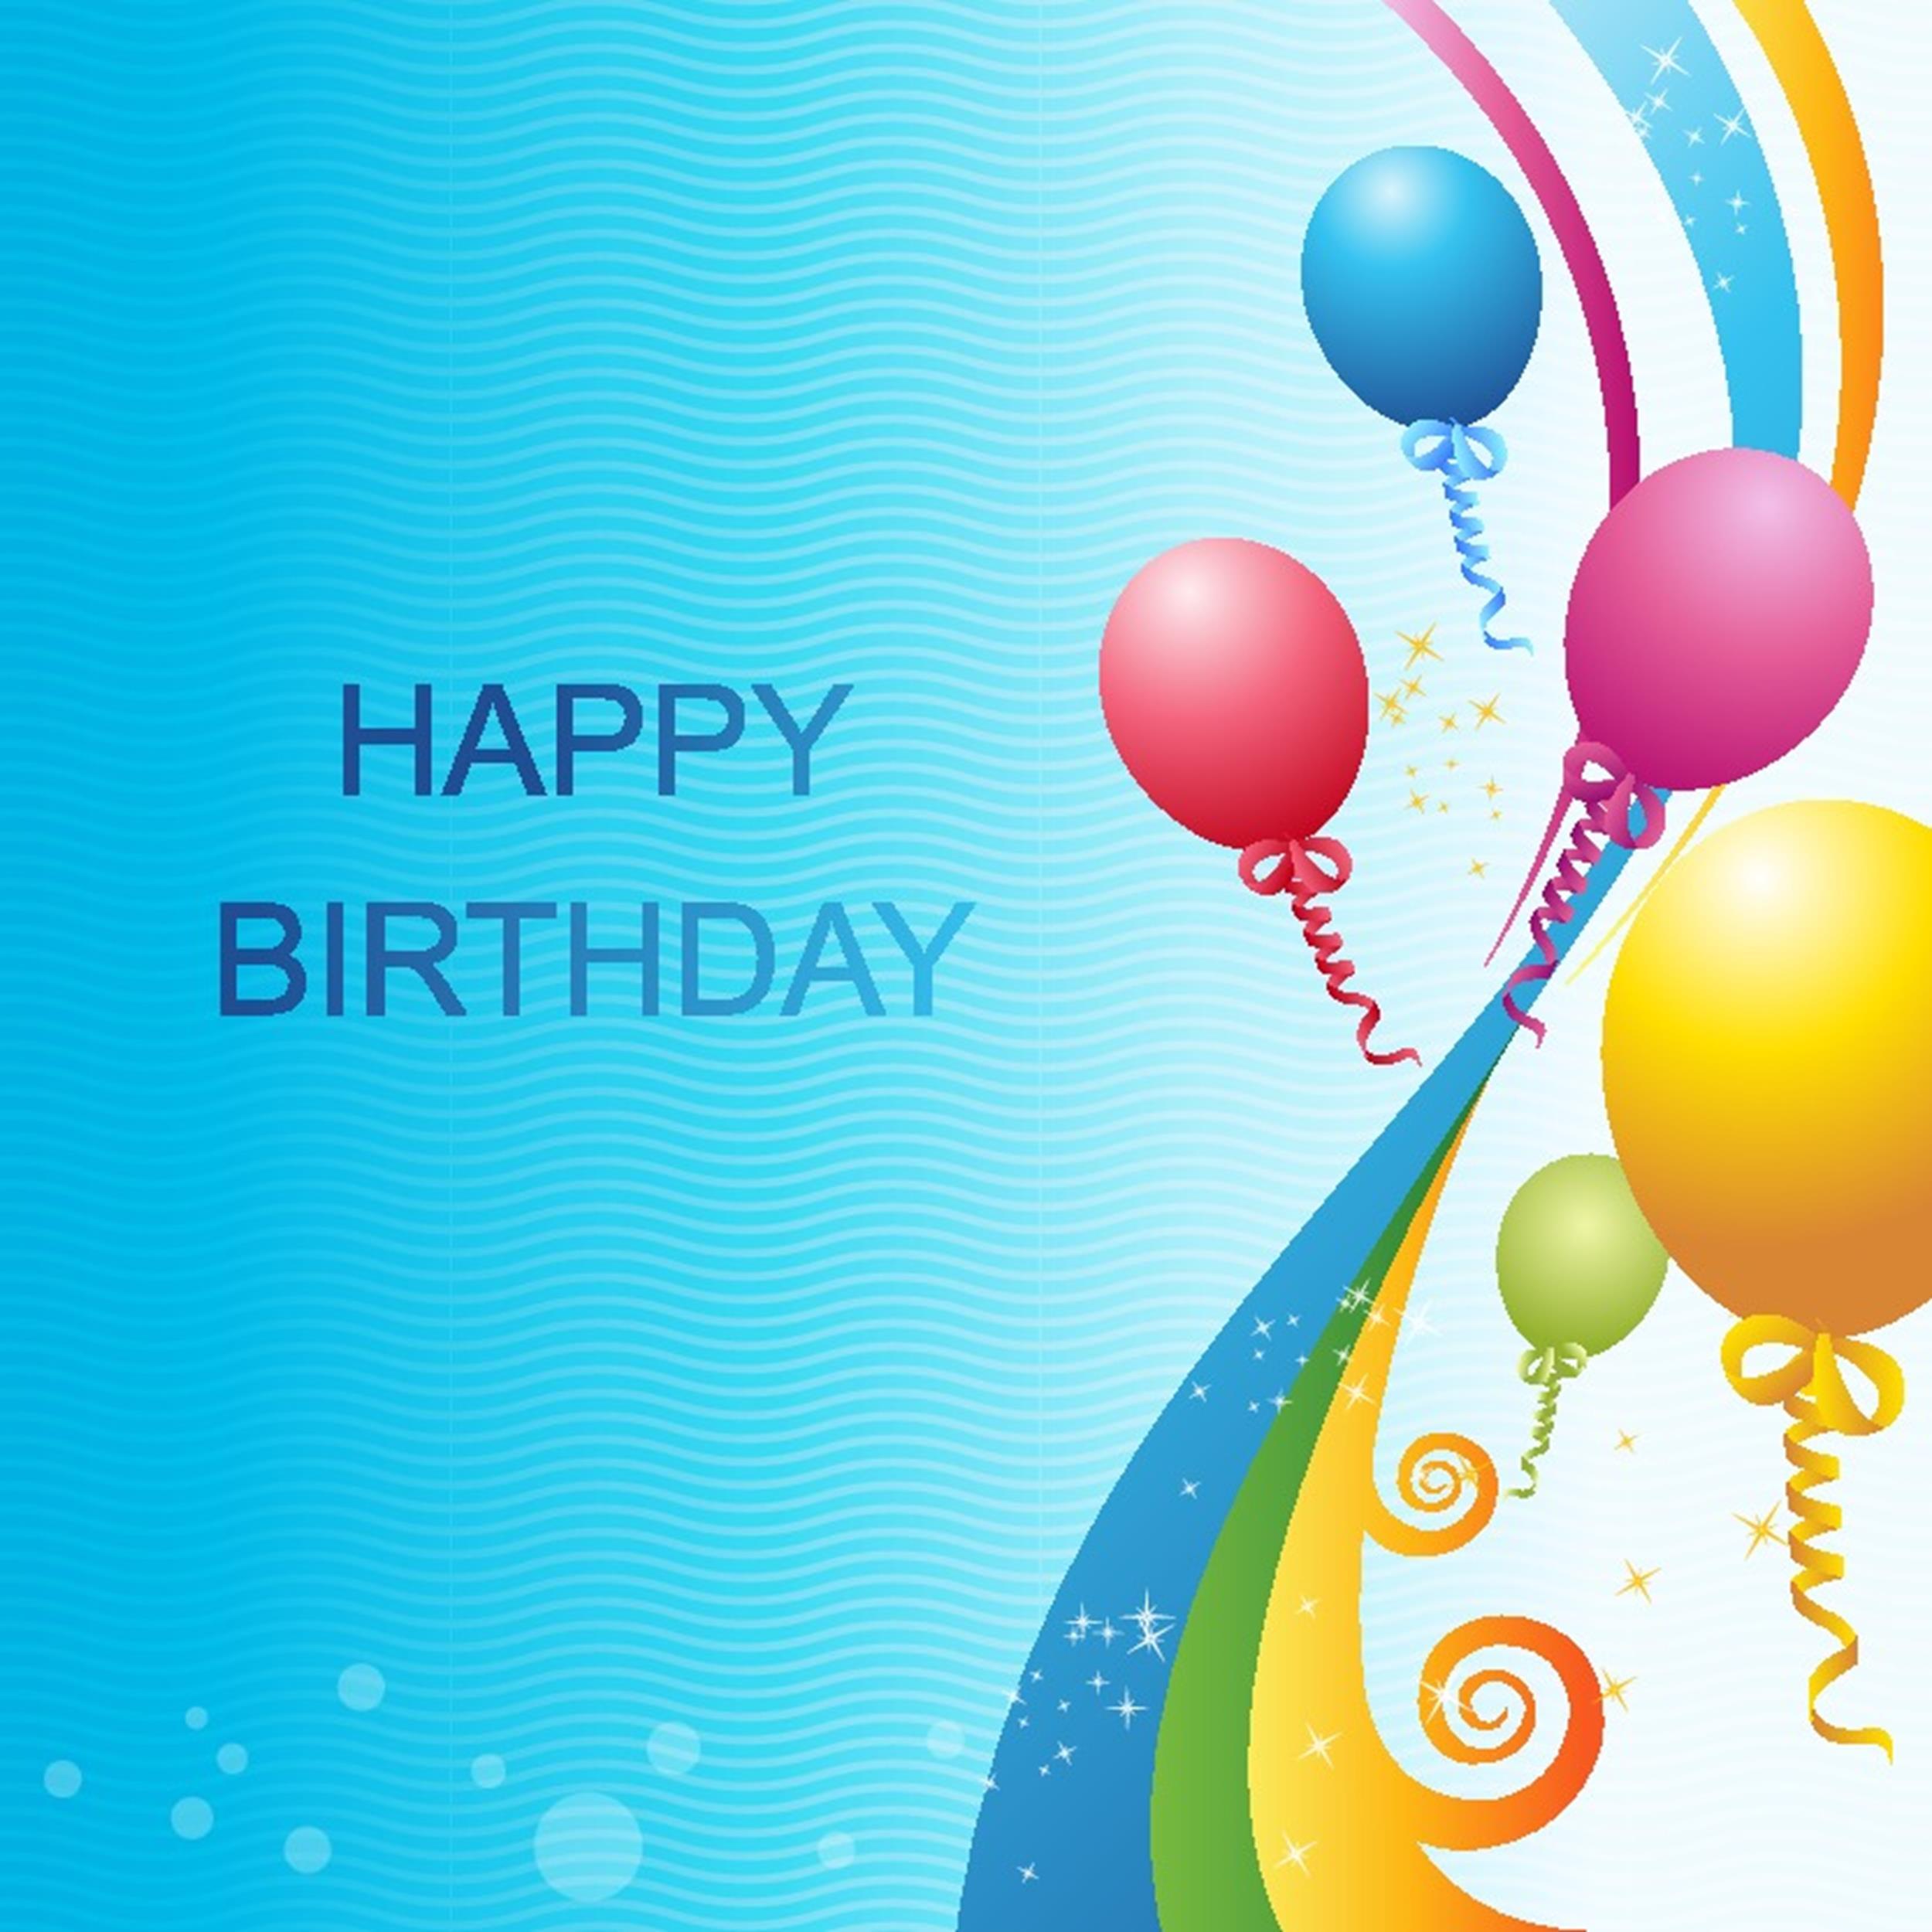 Free birthday card template 12